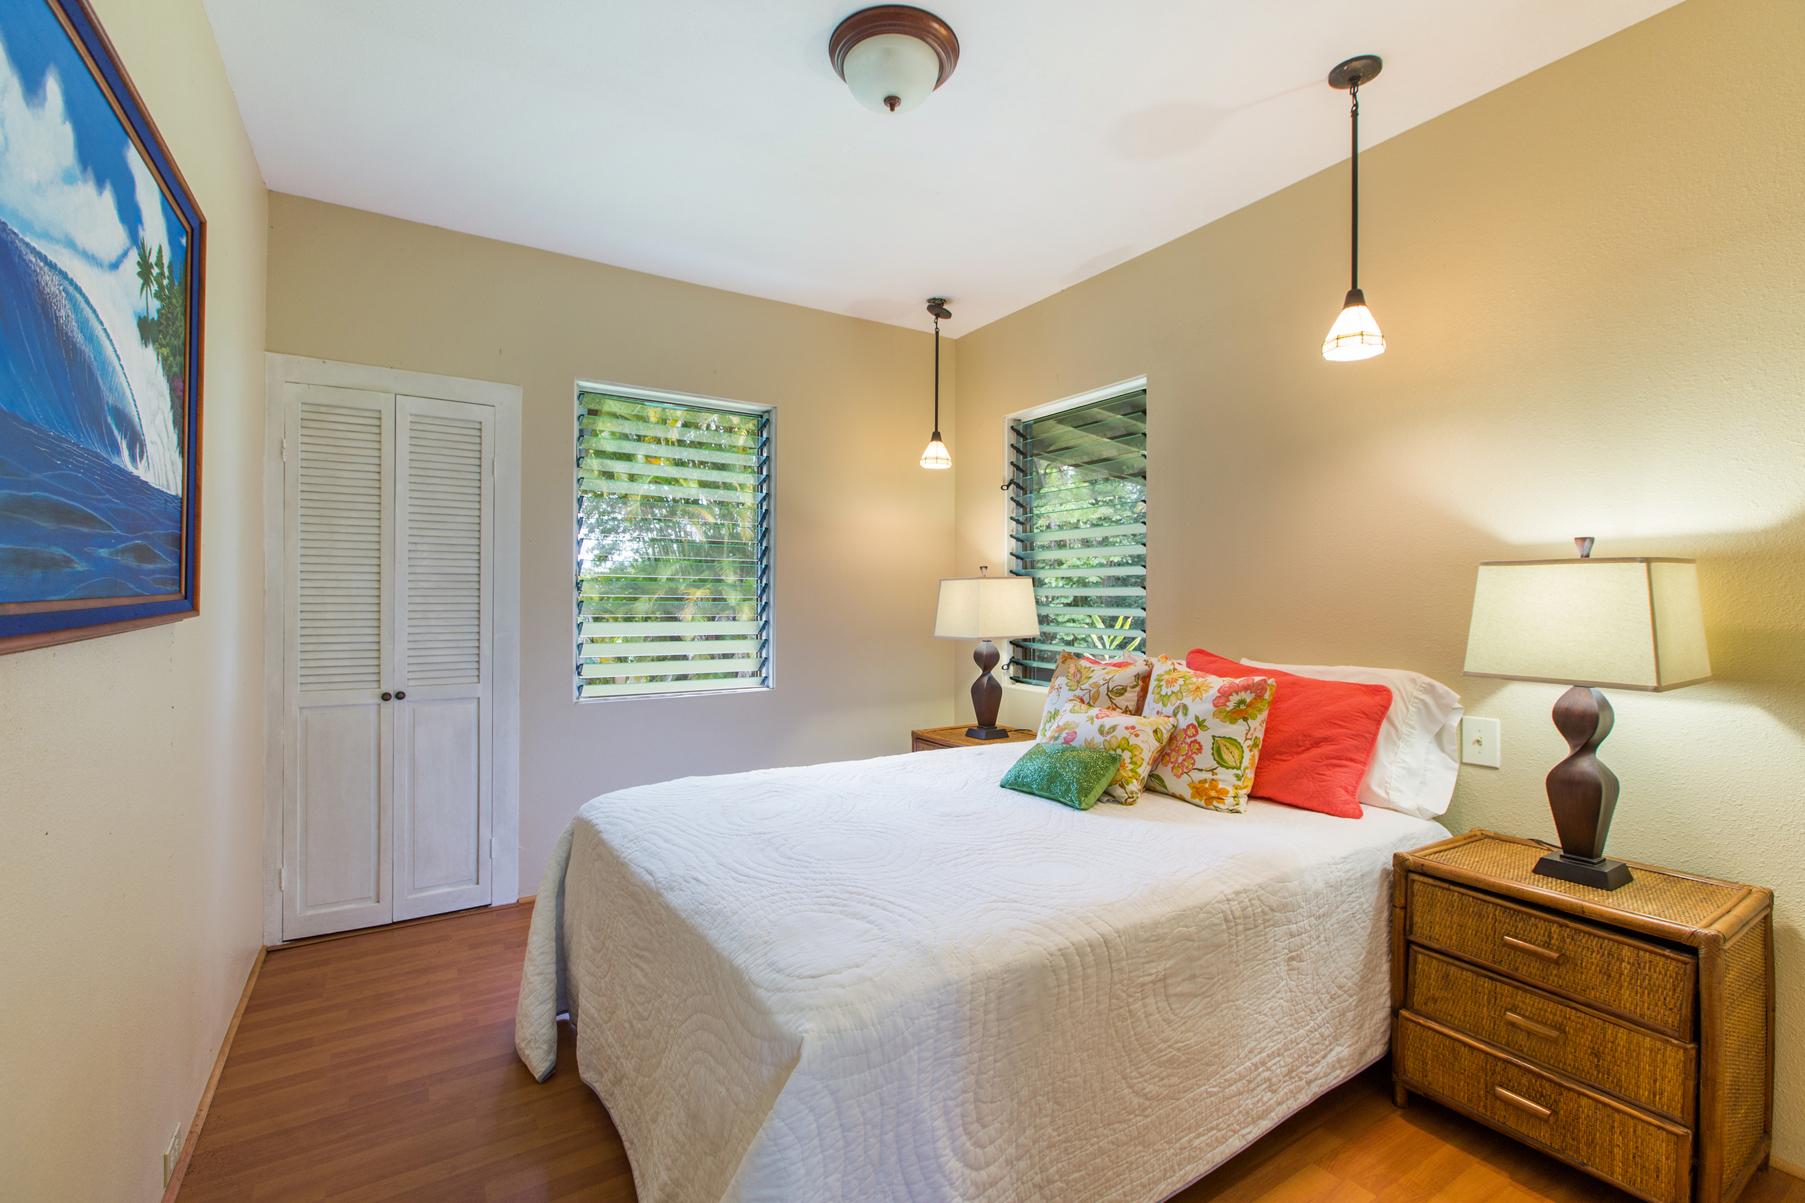 Additional photo for property listing at Timeless Retreat 95-1202 Kapanoe Street Mililani, Hawaii 96789 United States